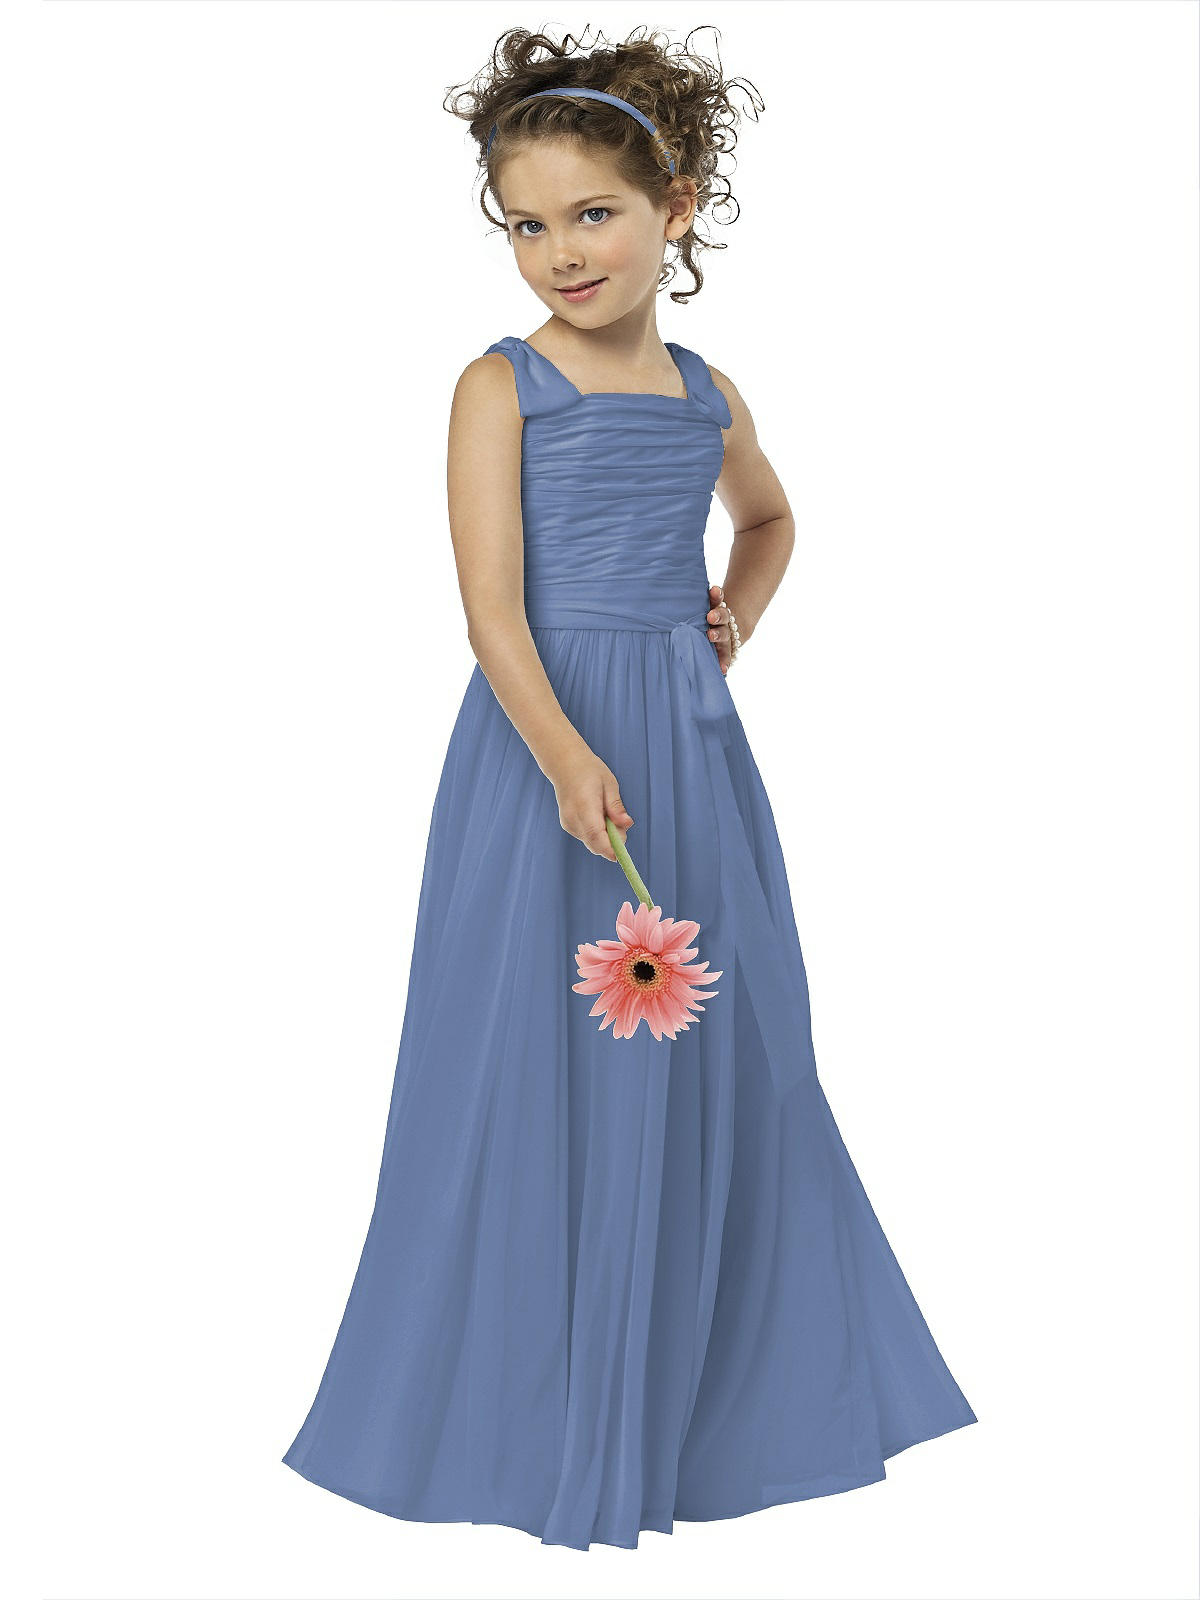 12069c390dbb Dessy Flowergirl Dresses - Dessy Flower Girl Dress FL4033